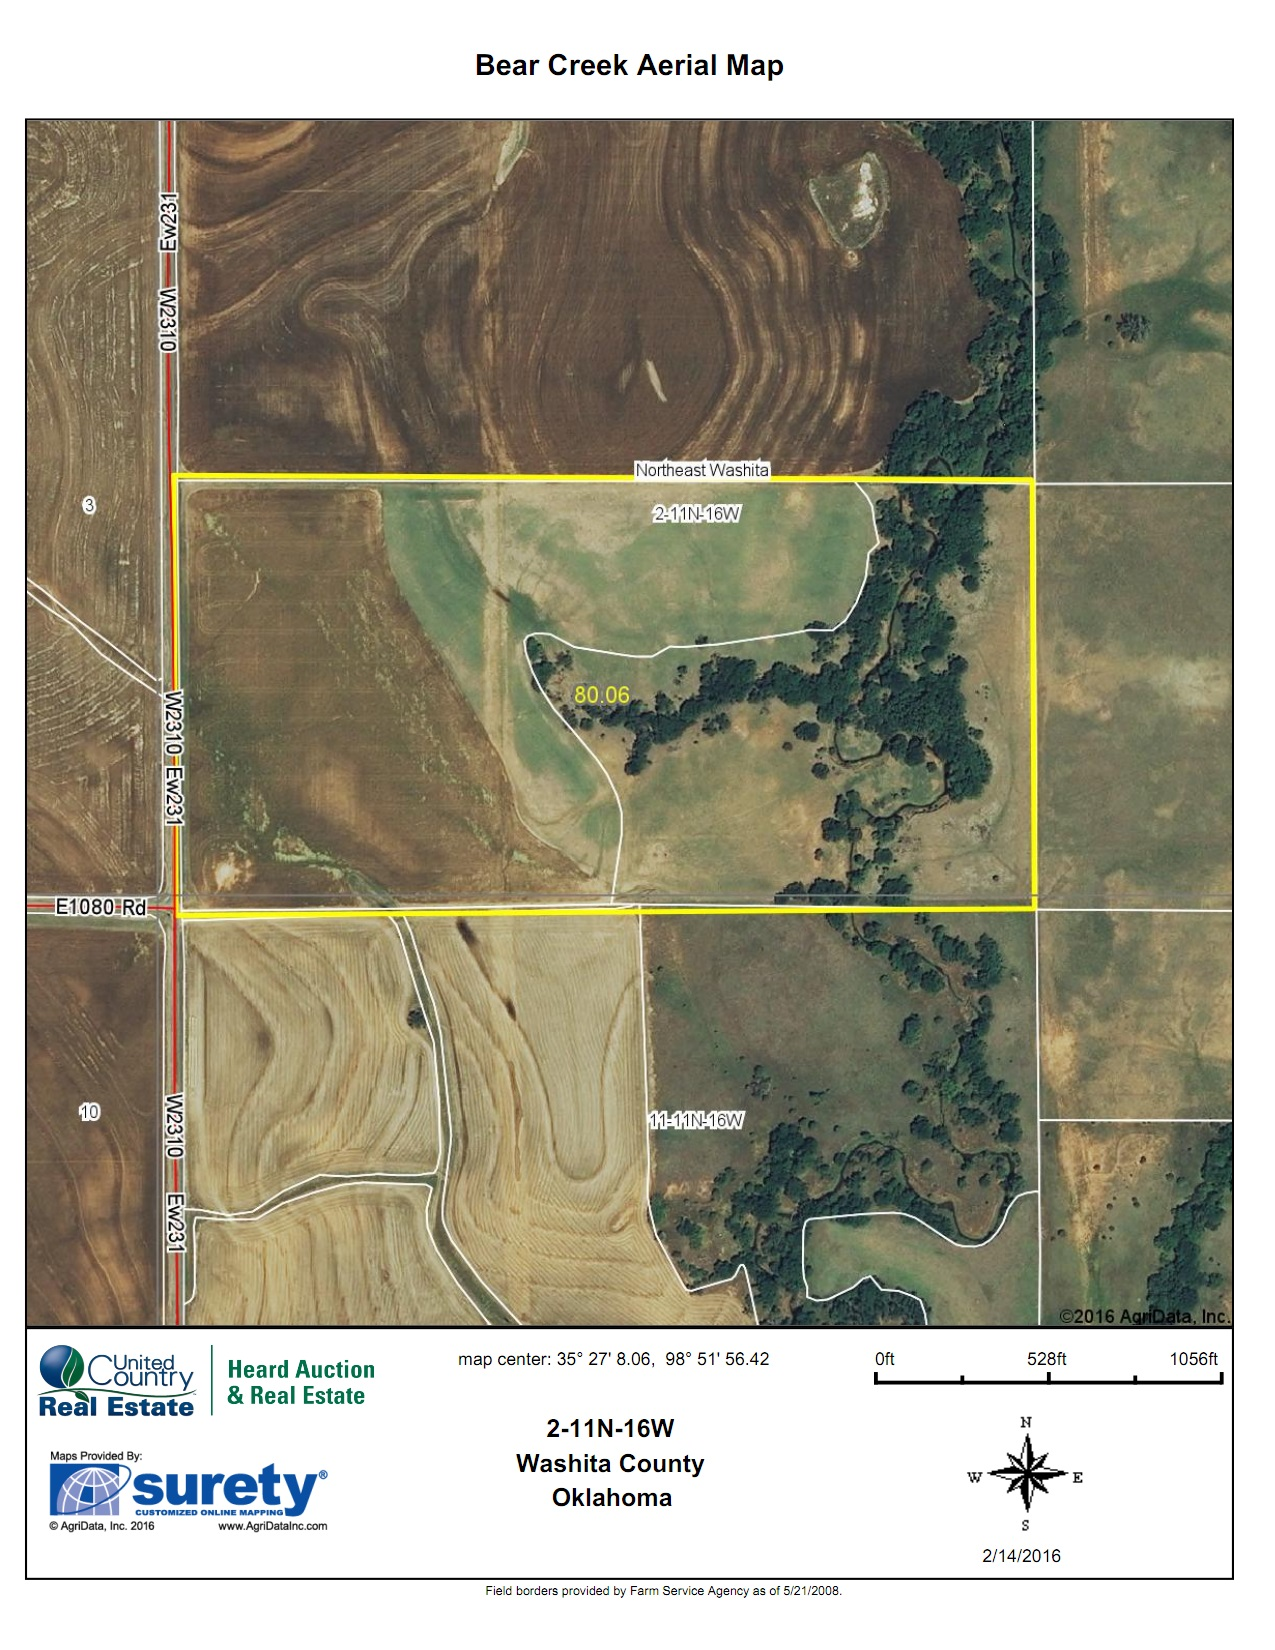 Oklahoma Farm for Sale, Washita County, Tract 7